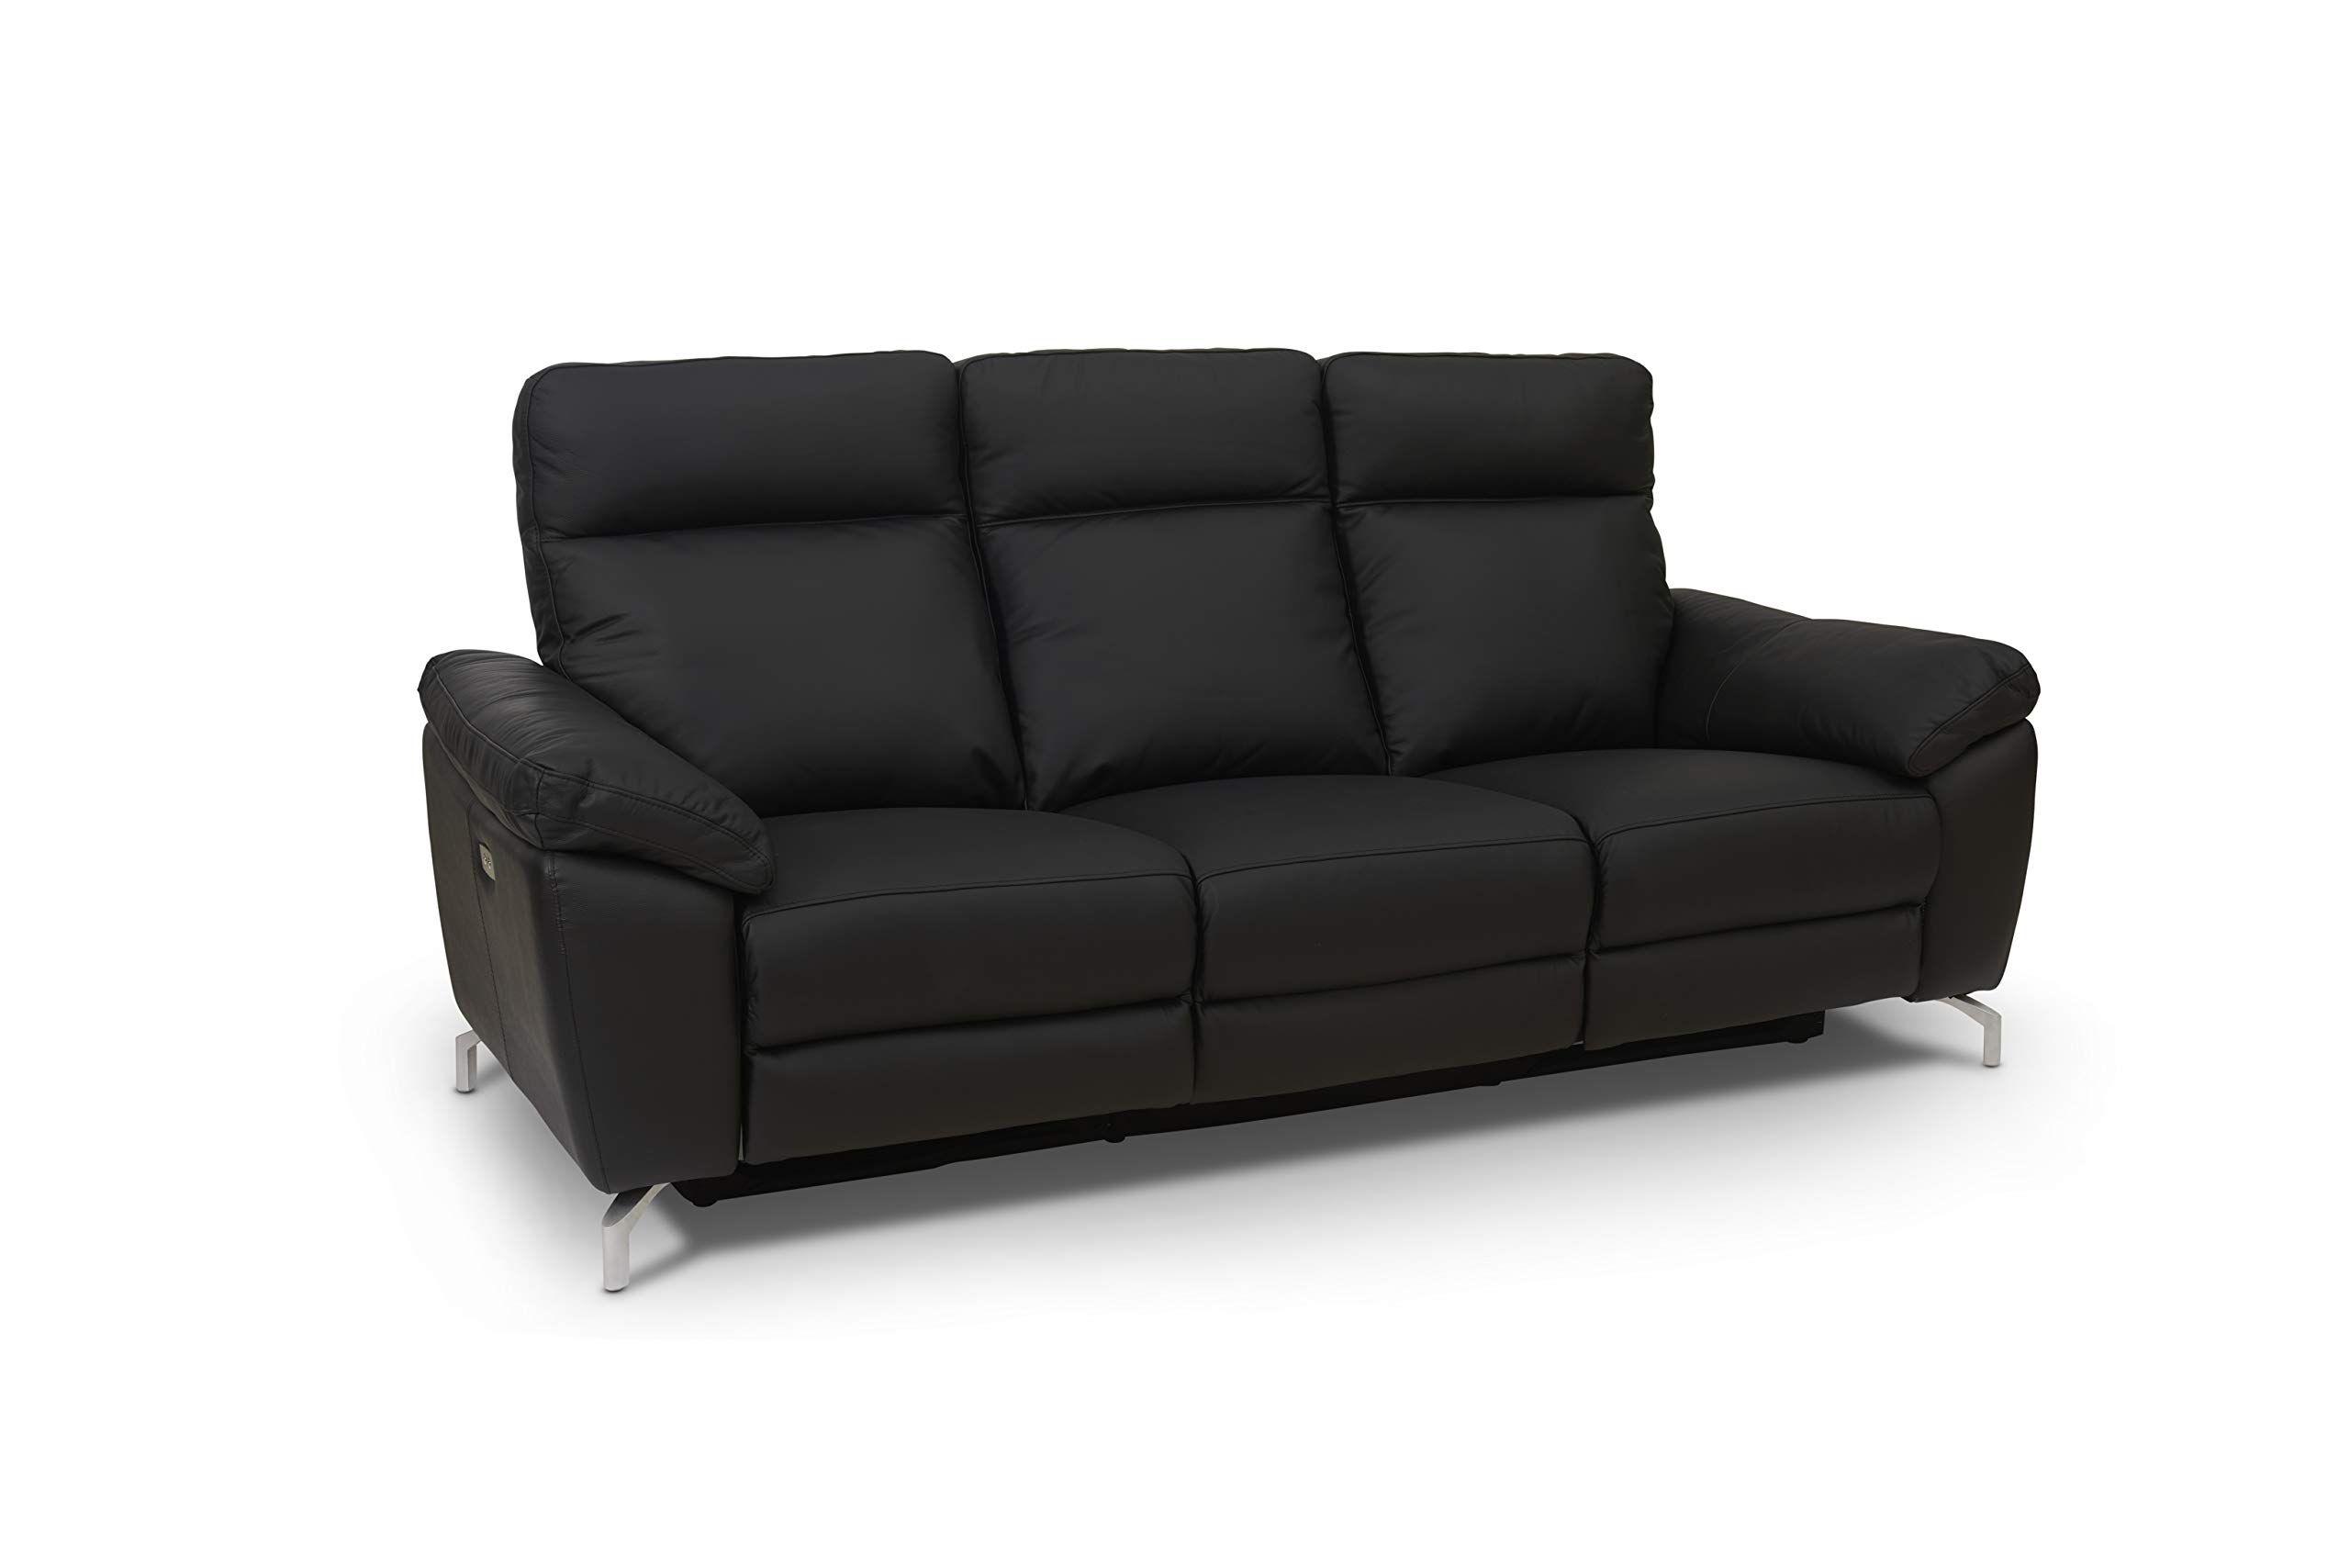 Ibbe Design Schwarz Echt Leder 3 Sitzer Relaxsofa Elektrisch Relaxfunktion Sofa Liegefunktion Doha Mit Fussteil 222x96x101 Cm In 2020 With Images Sofa Couch Furniture